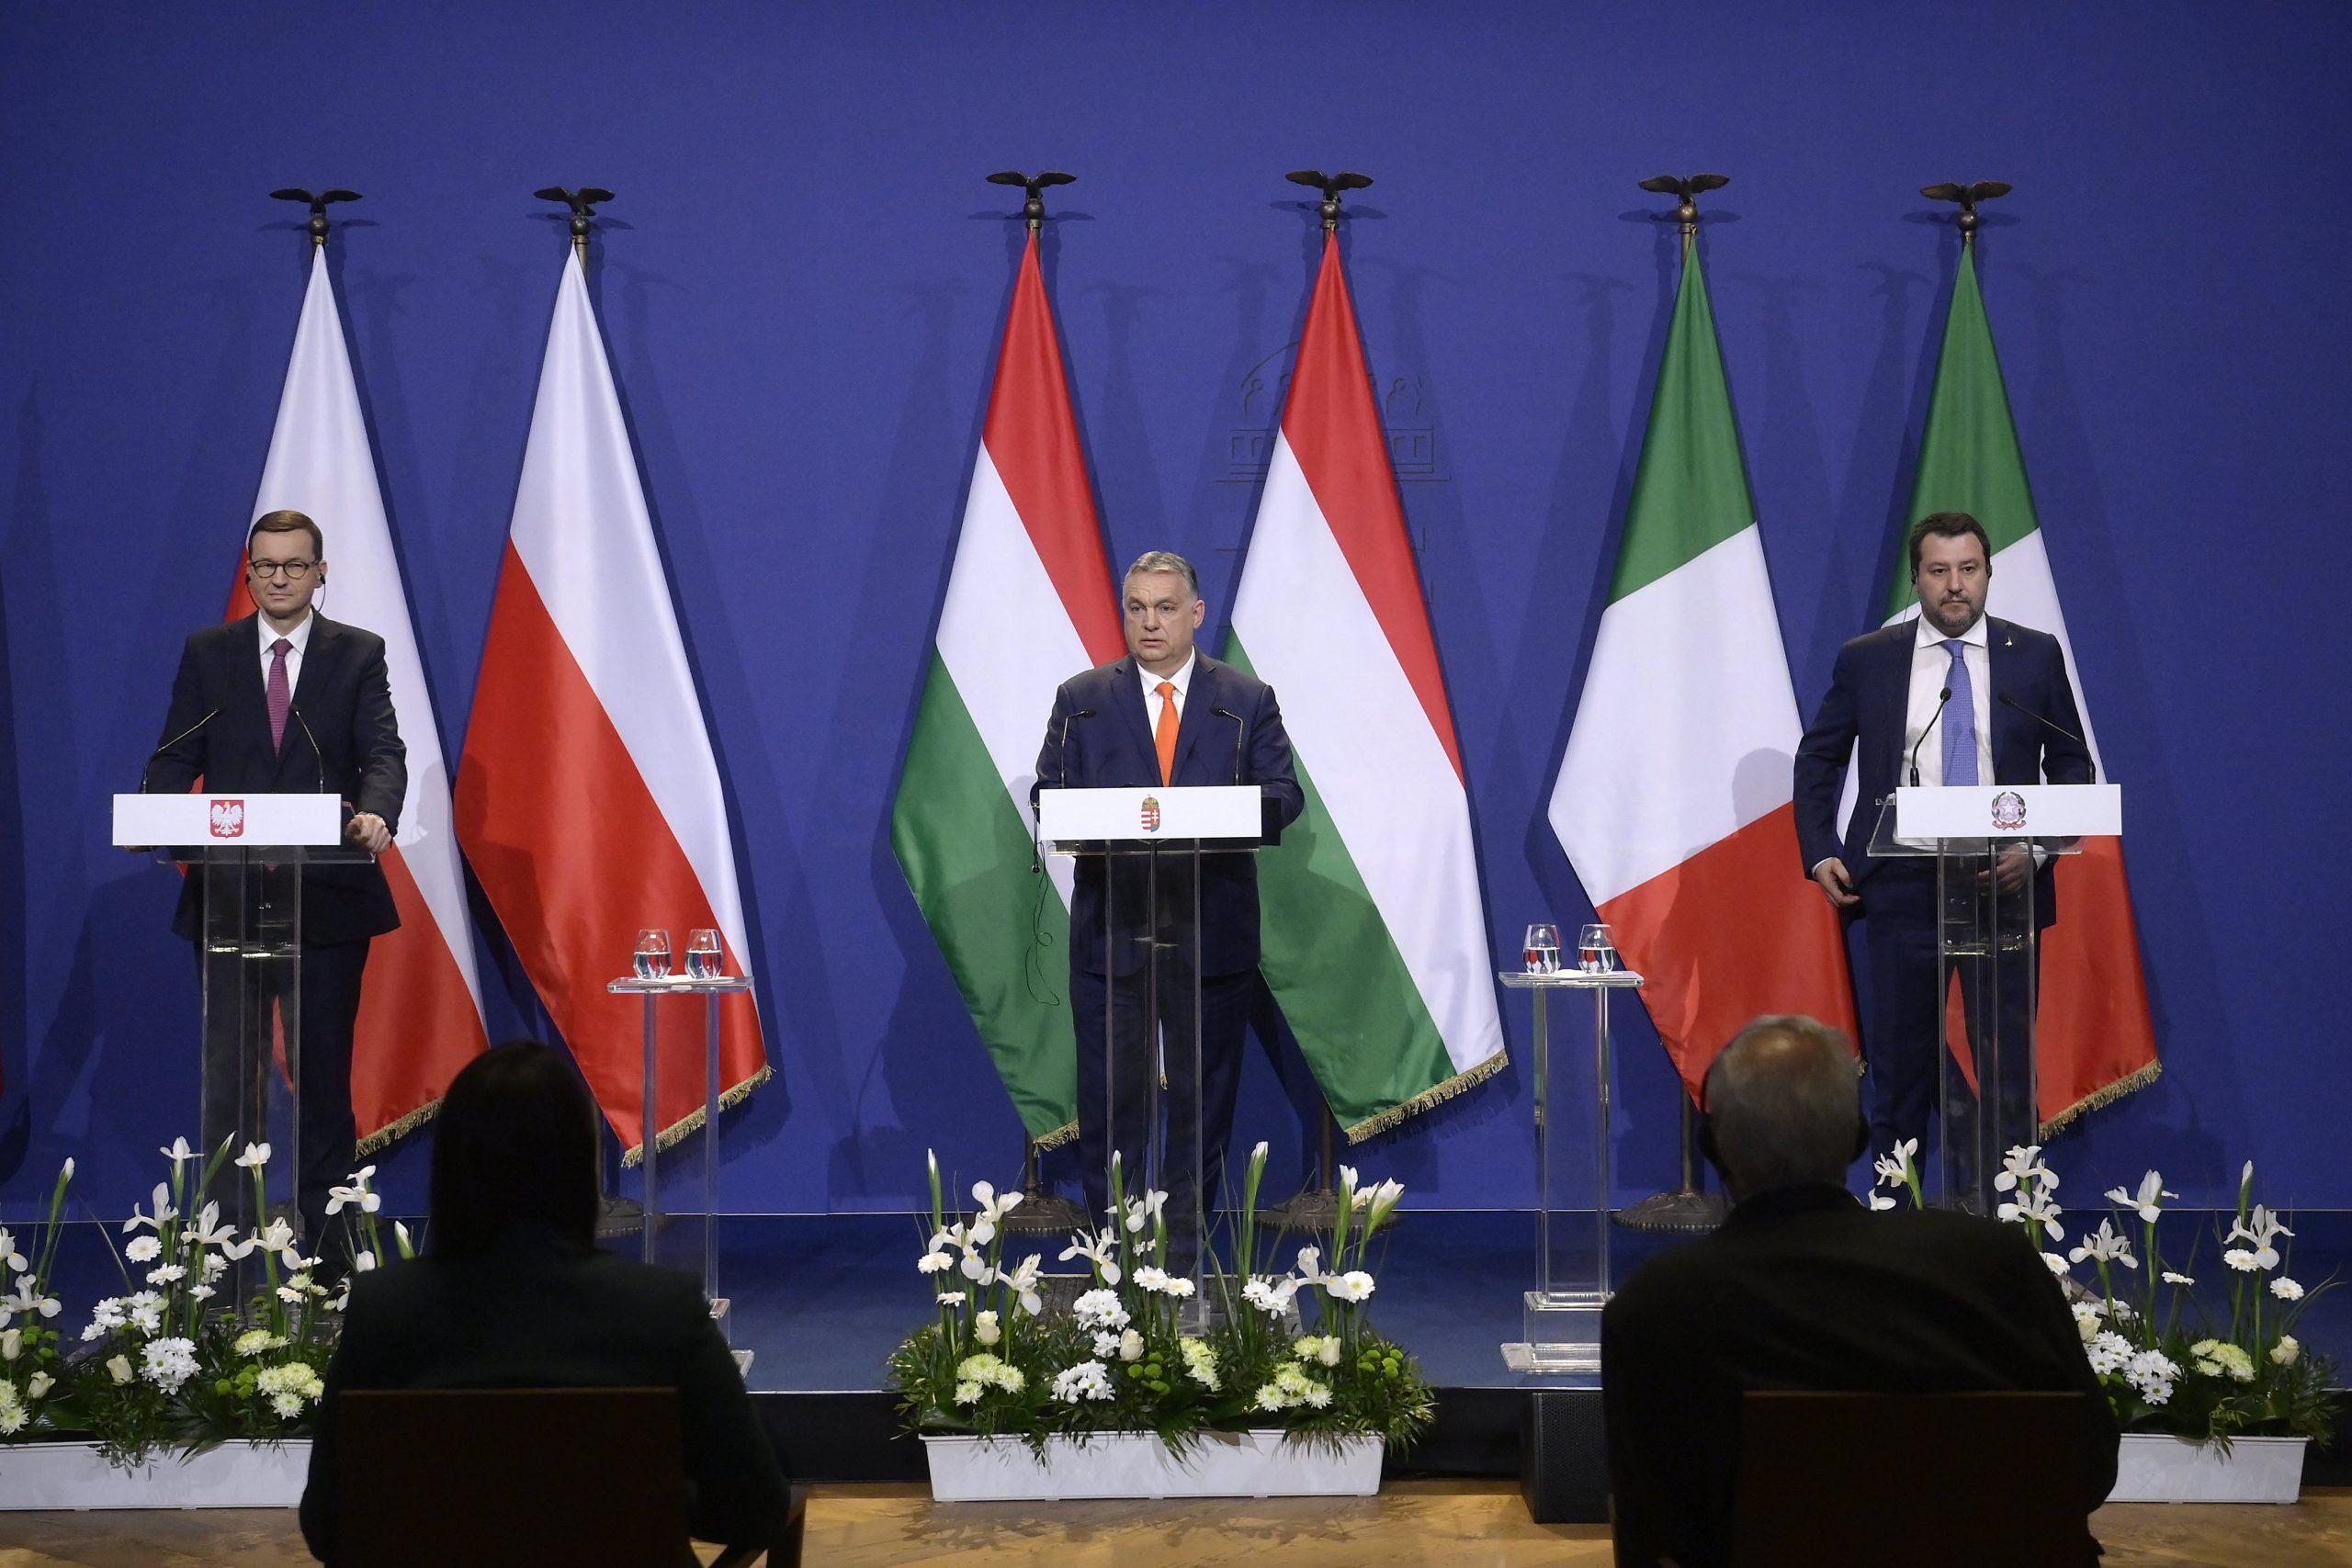 Austrian Journalist's Questions to Fidesz Spark Diplomatic Tension